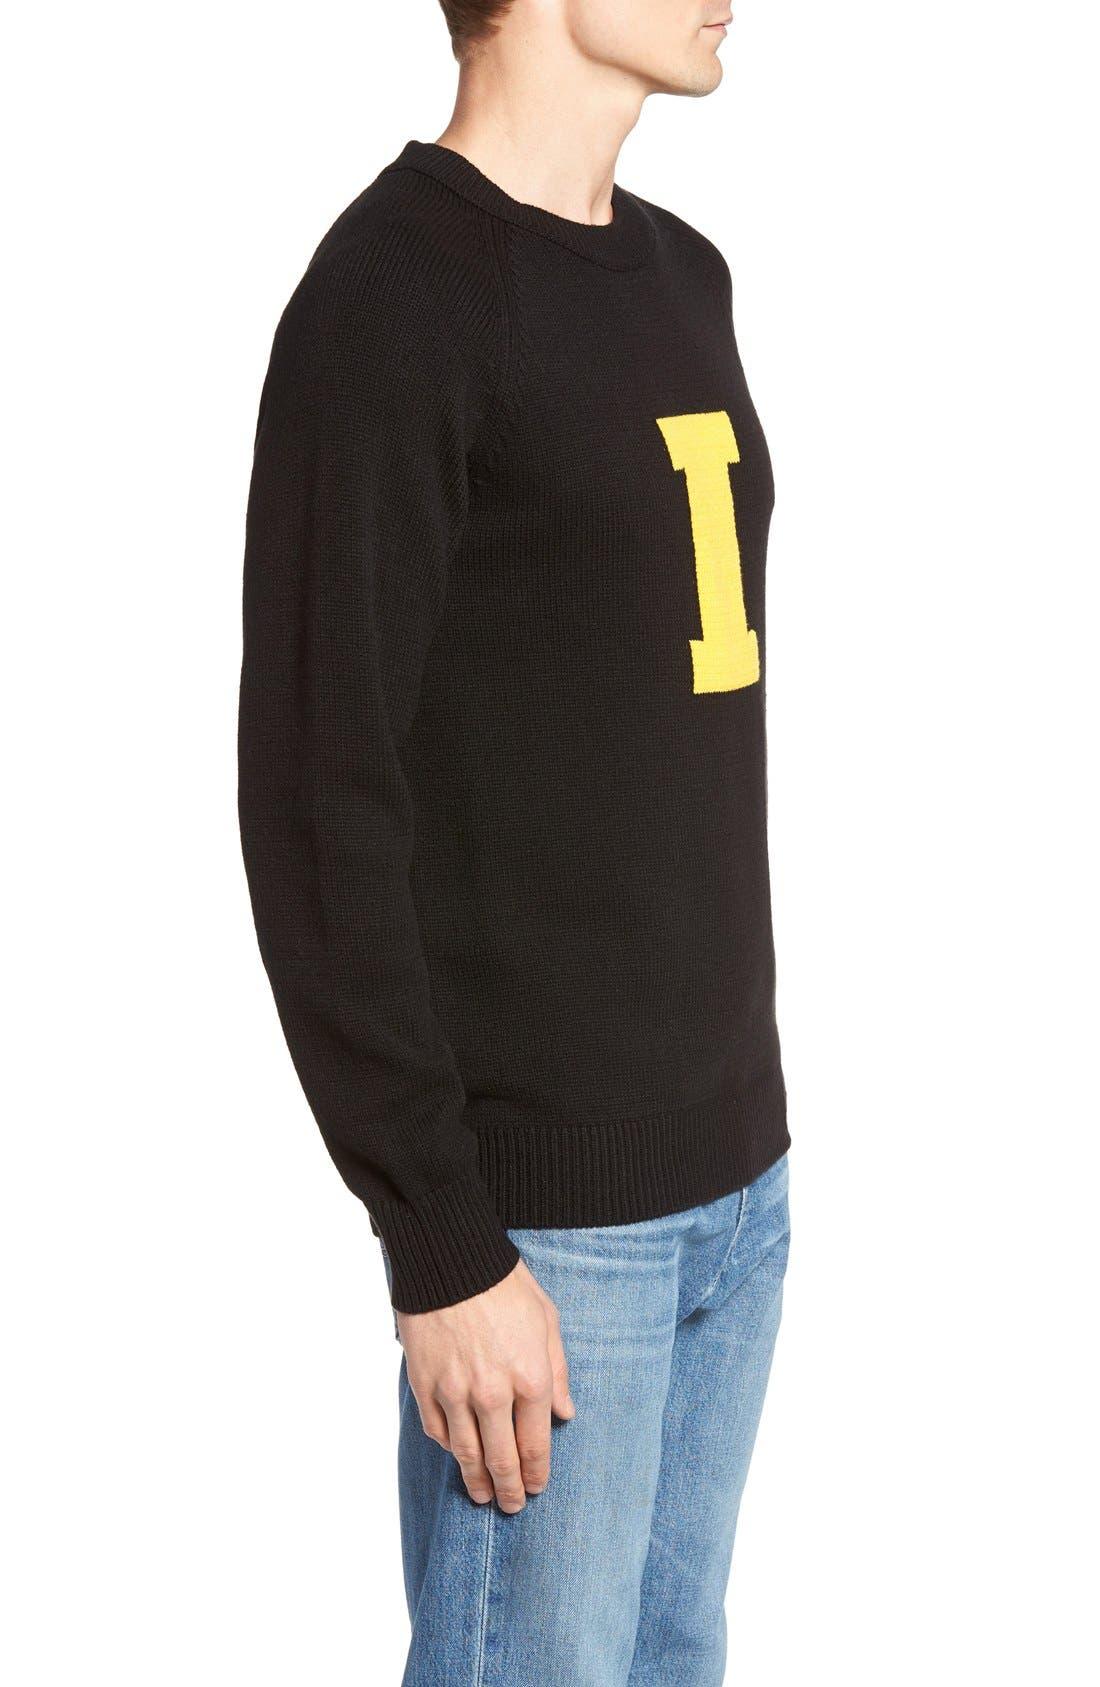 HILLFLINT,                             Iowa Heritage Sweater,                             Alternate thumbnail 3, color,                             001